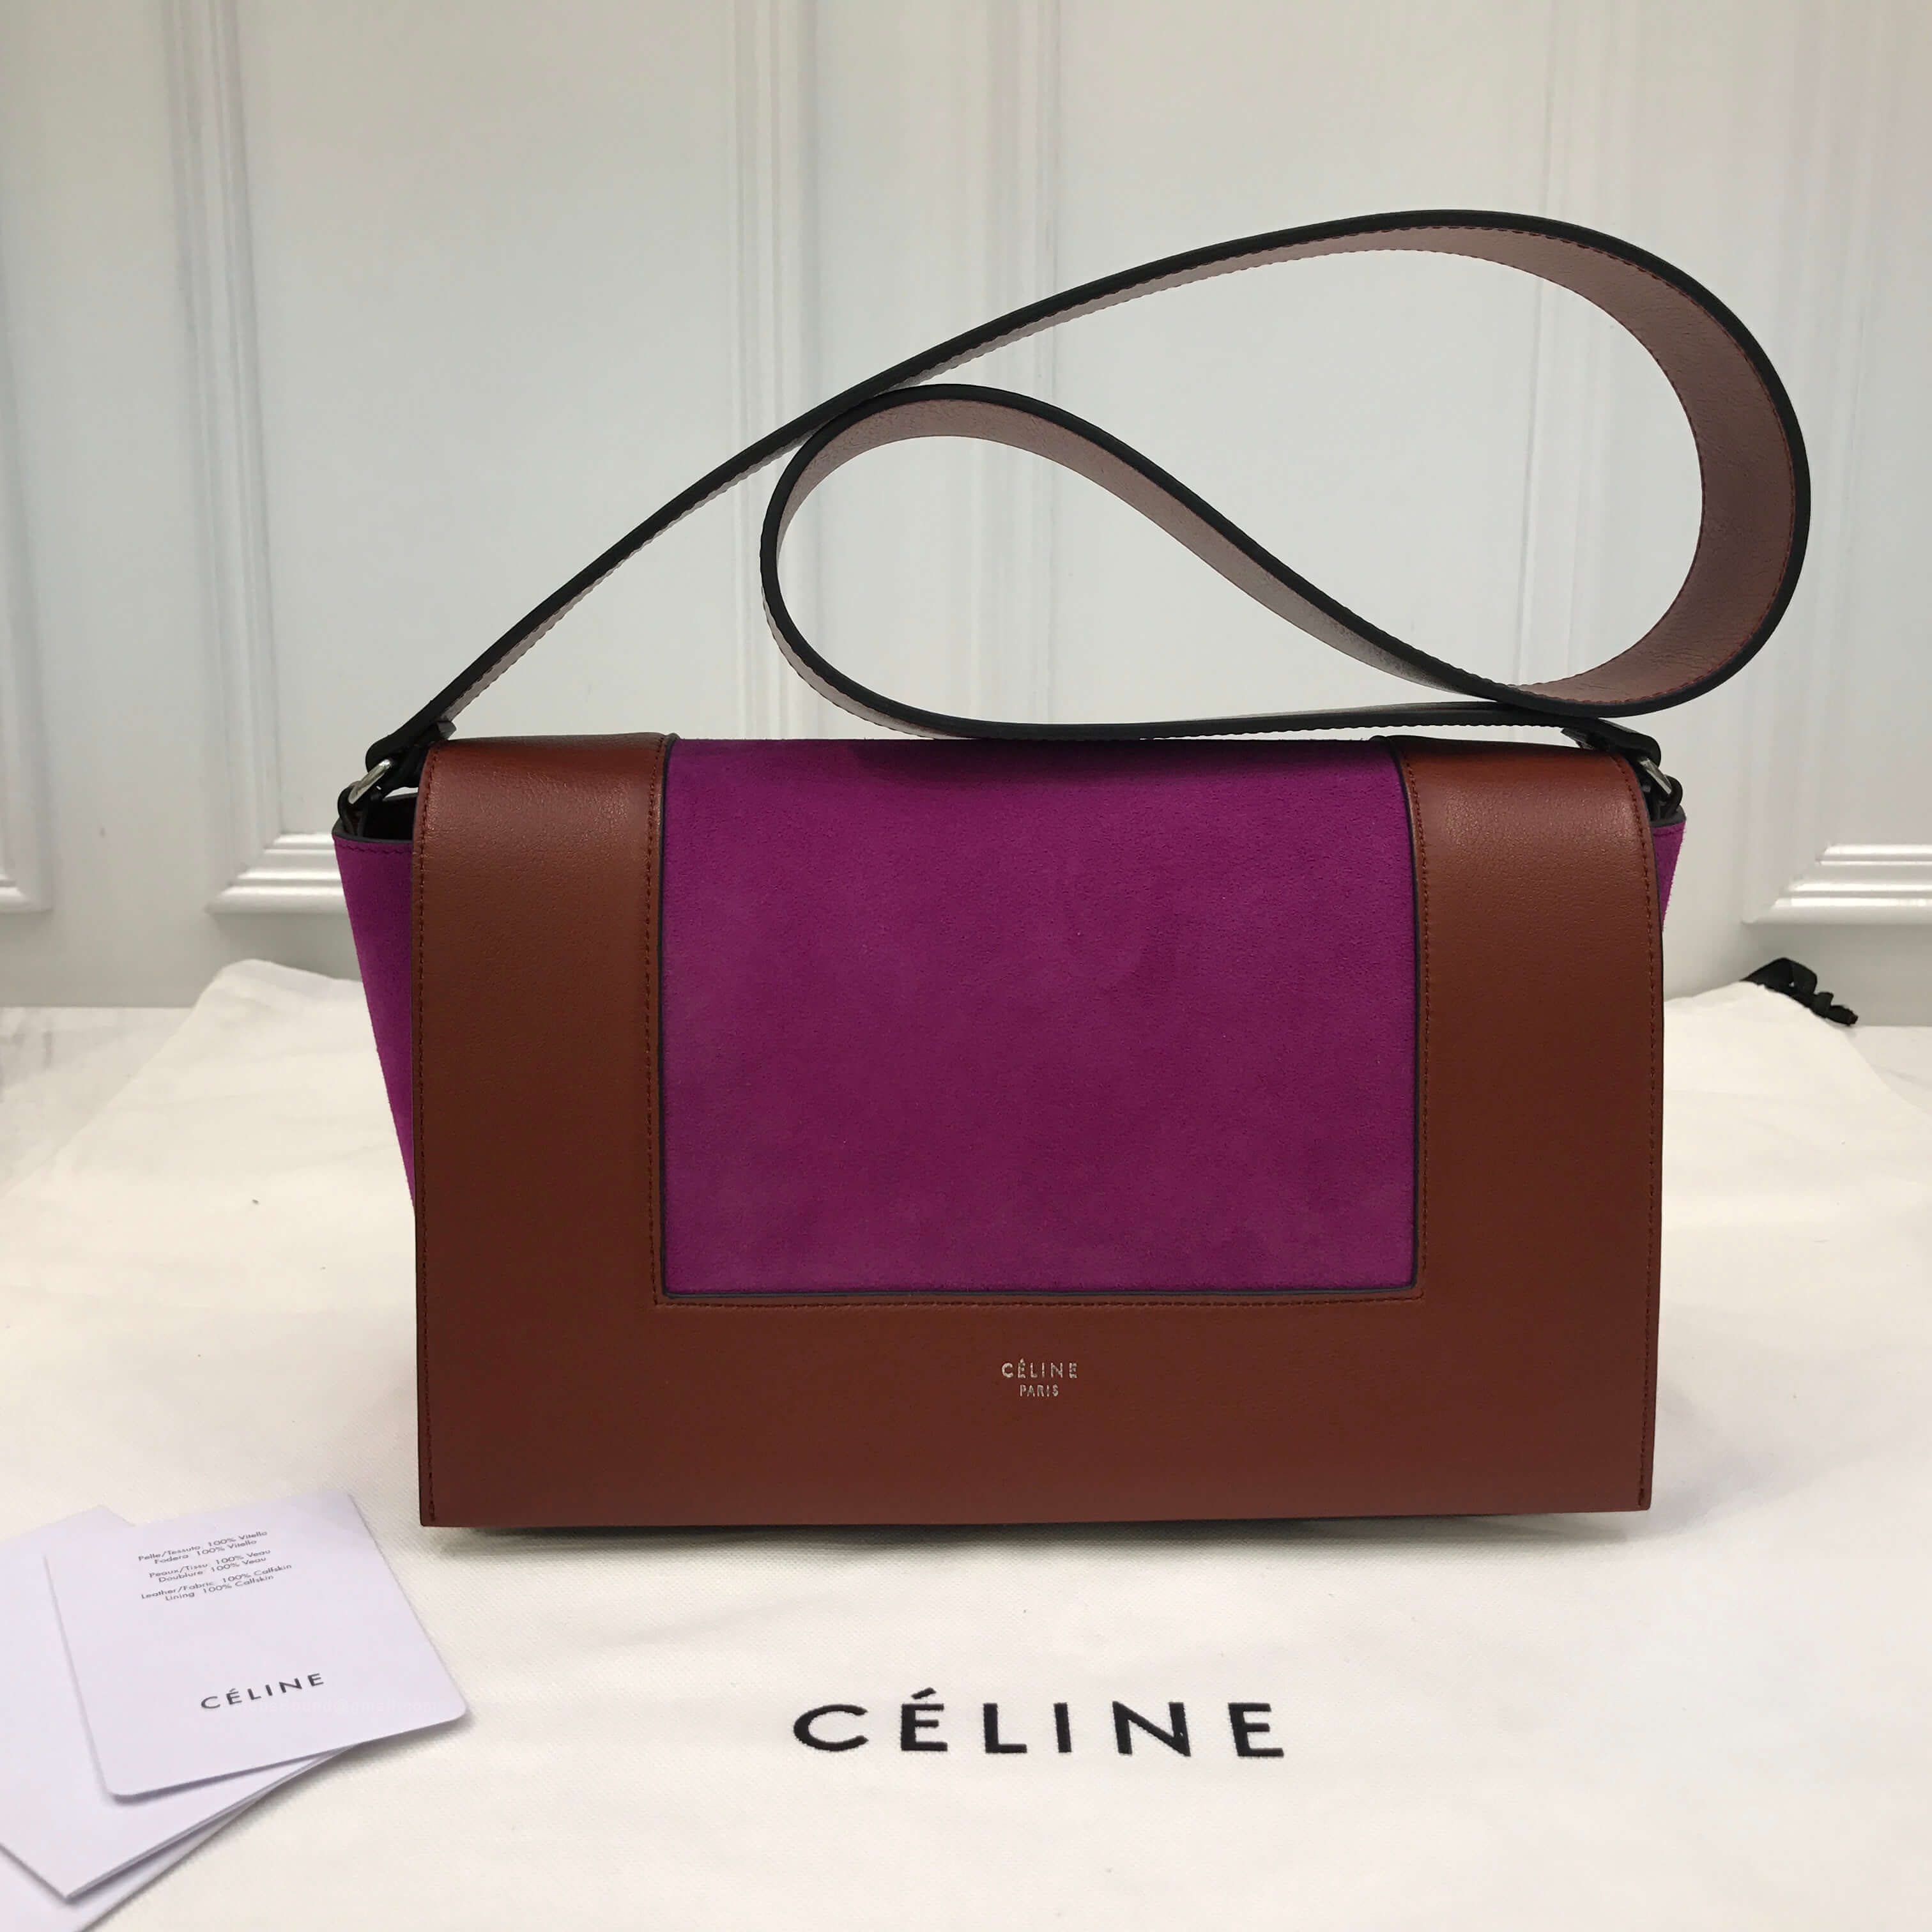 85491bfdac21 Celine Medium Frame Bag in Burnt Red and Magenta Smooth Calfskin -